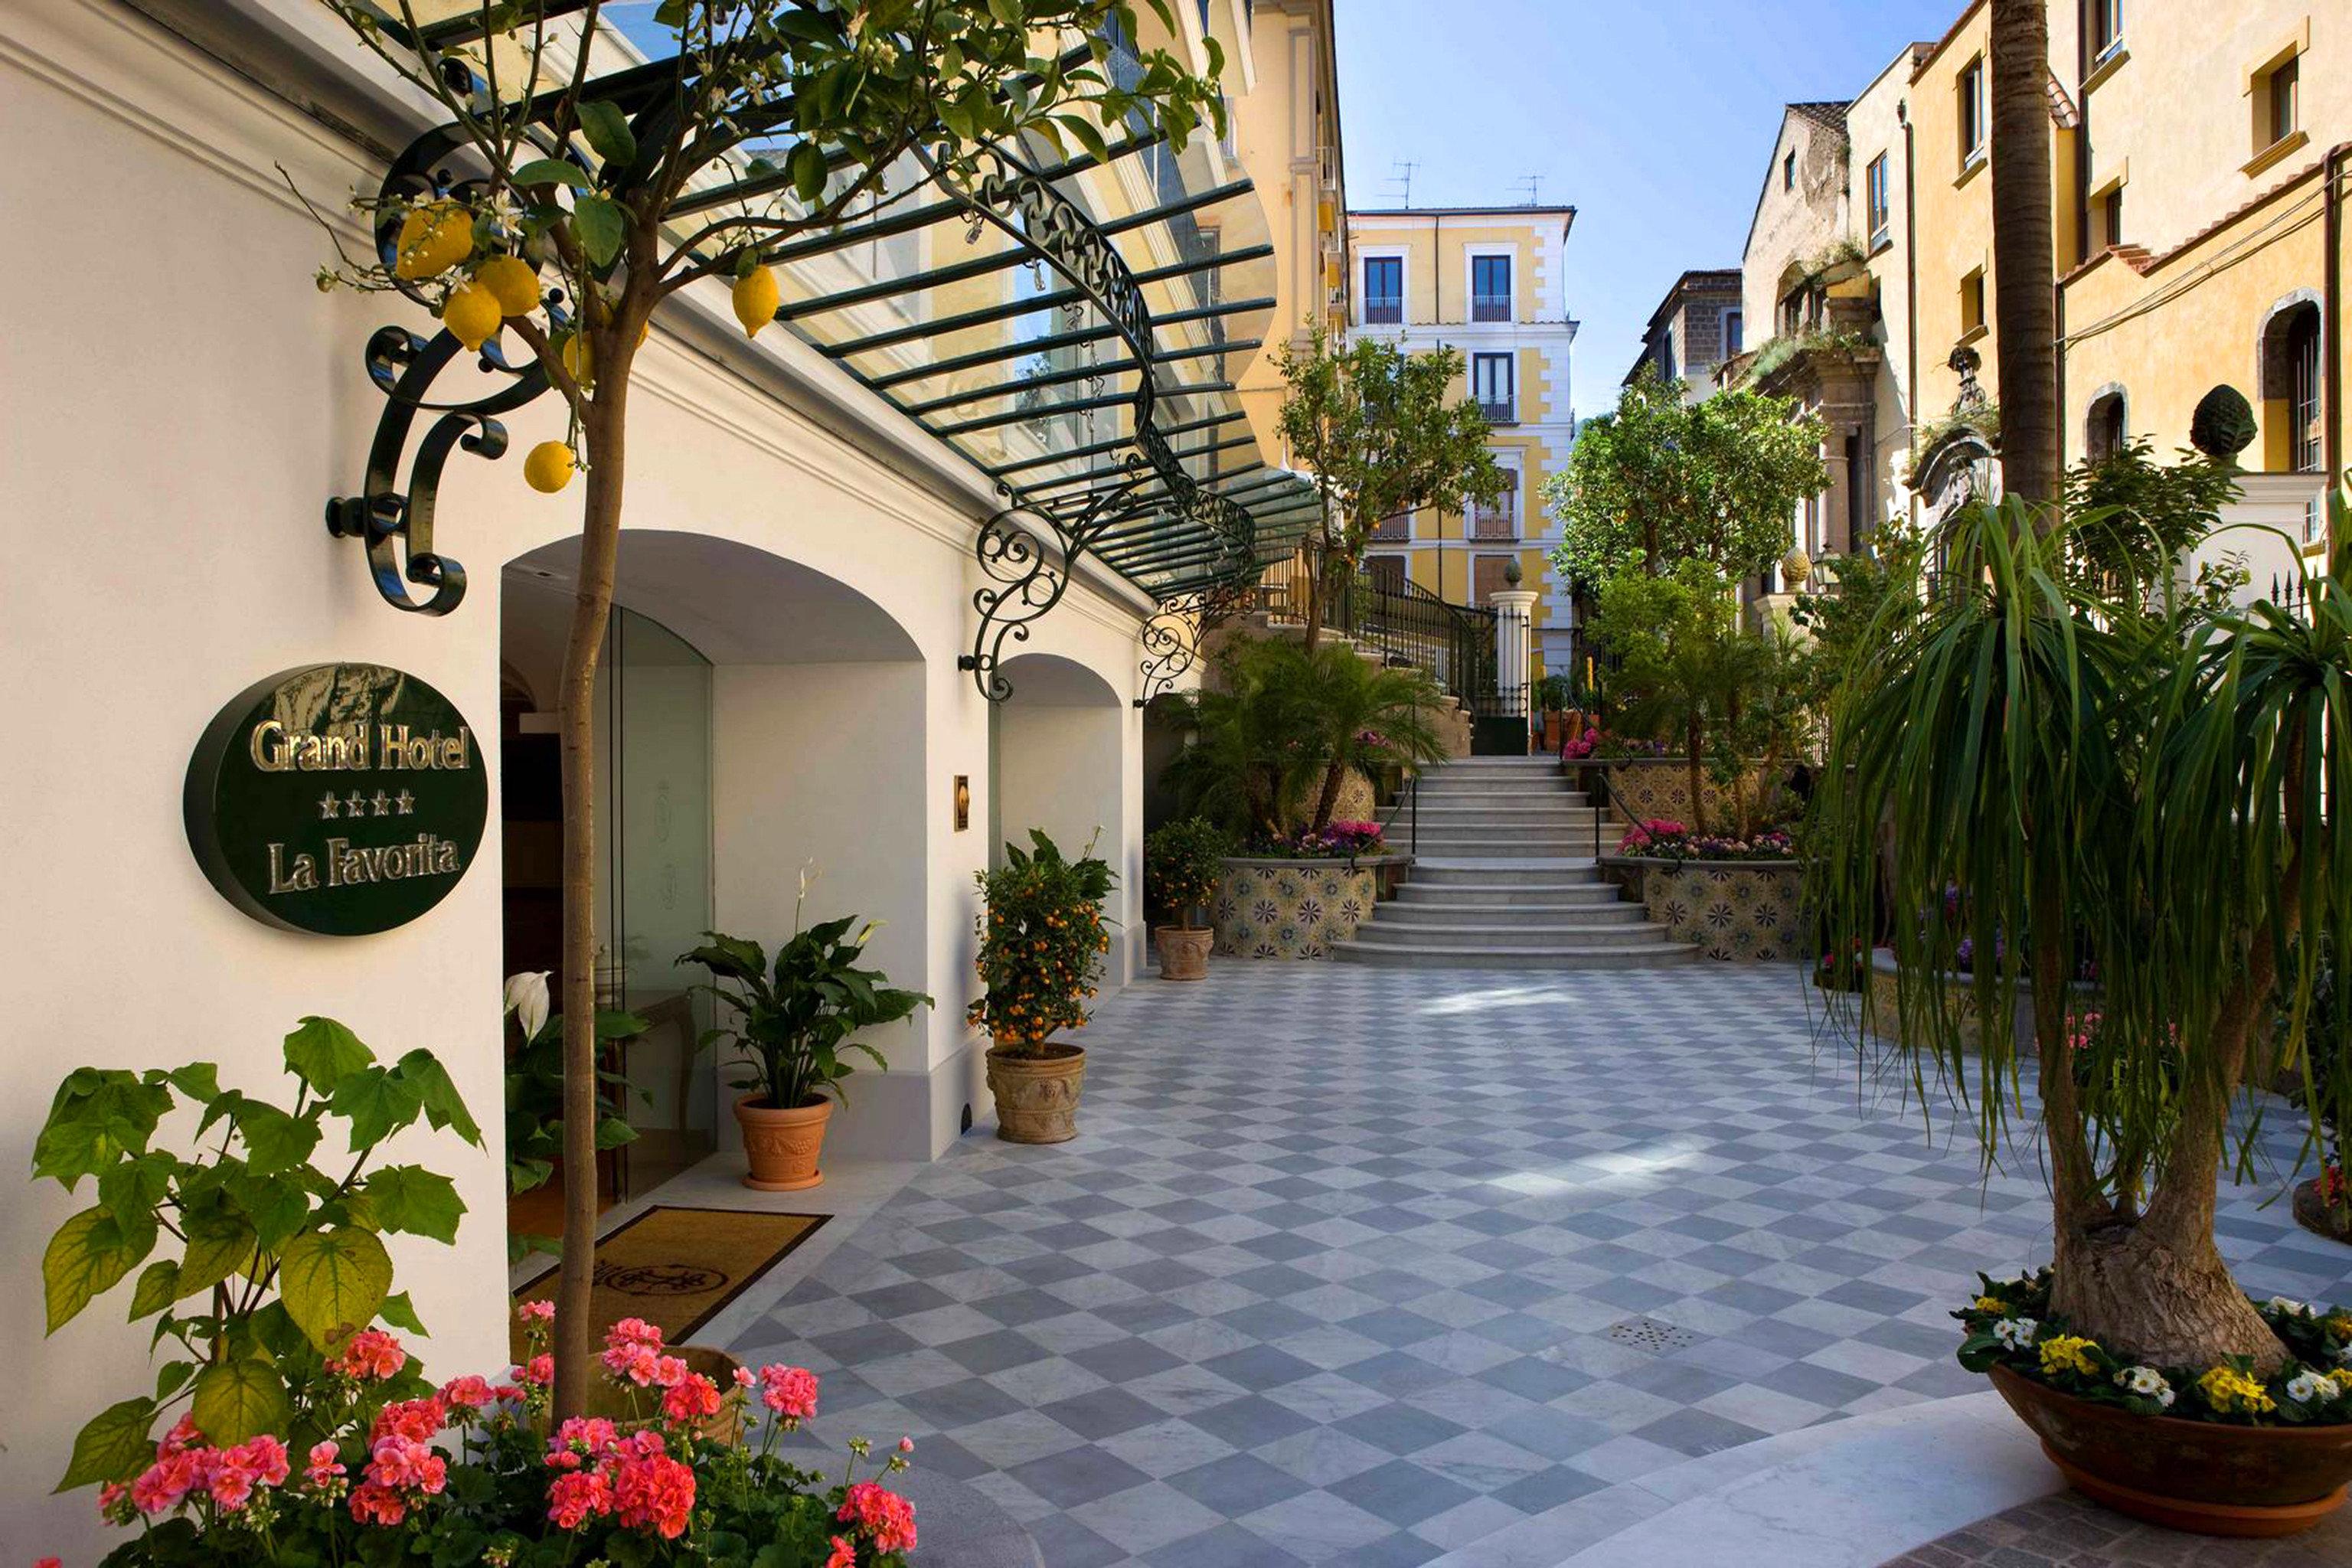 Classic Grounds Scenic views Sea plant property Courtyard flower neighbourhood plaza residential area condominium Garden